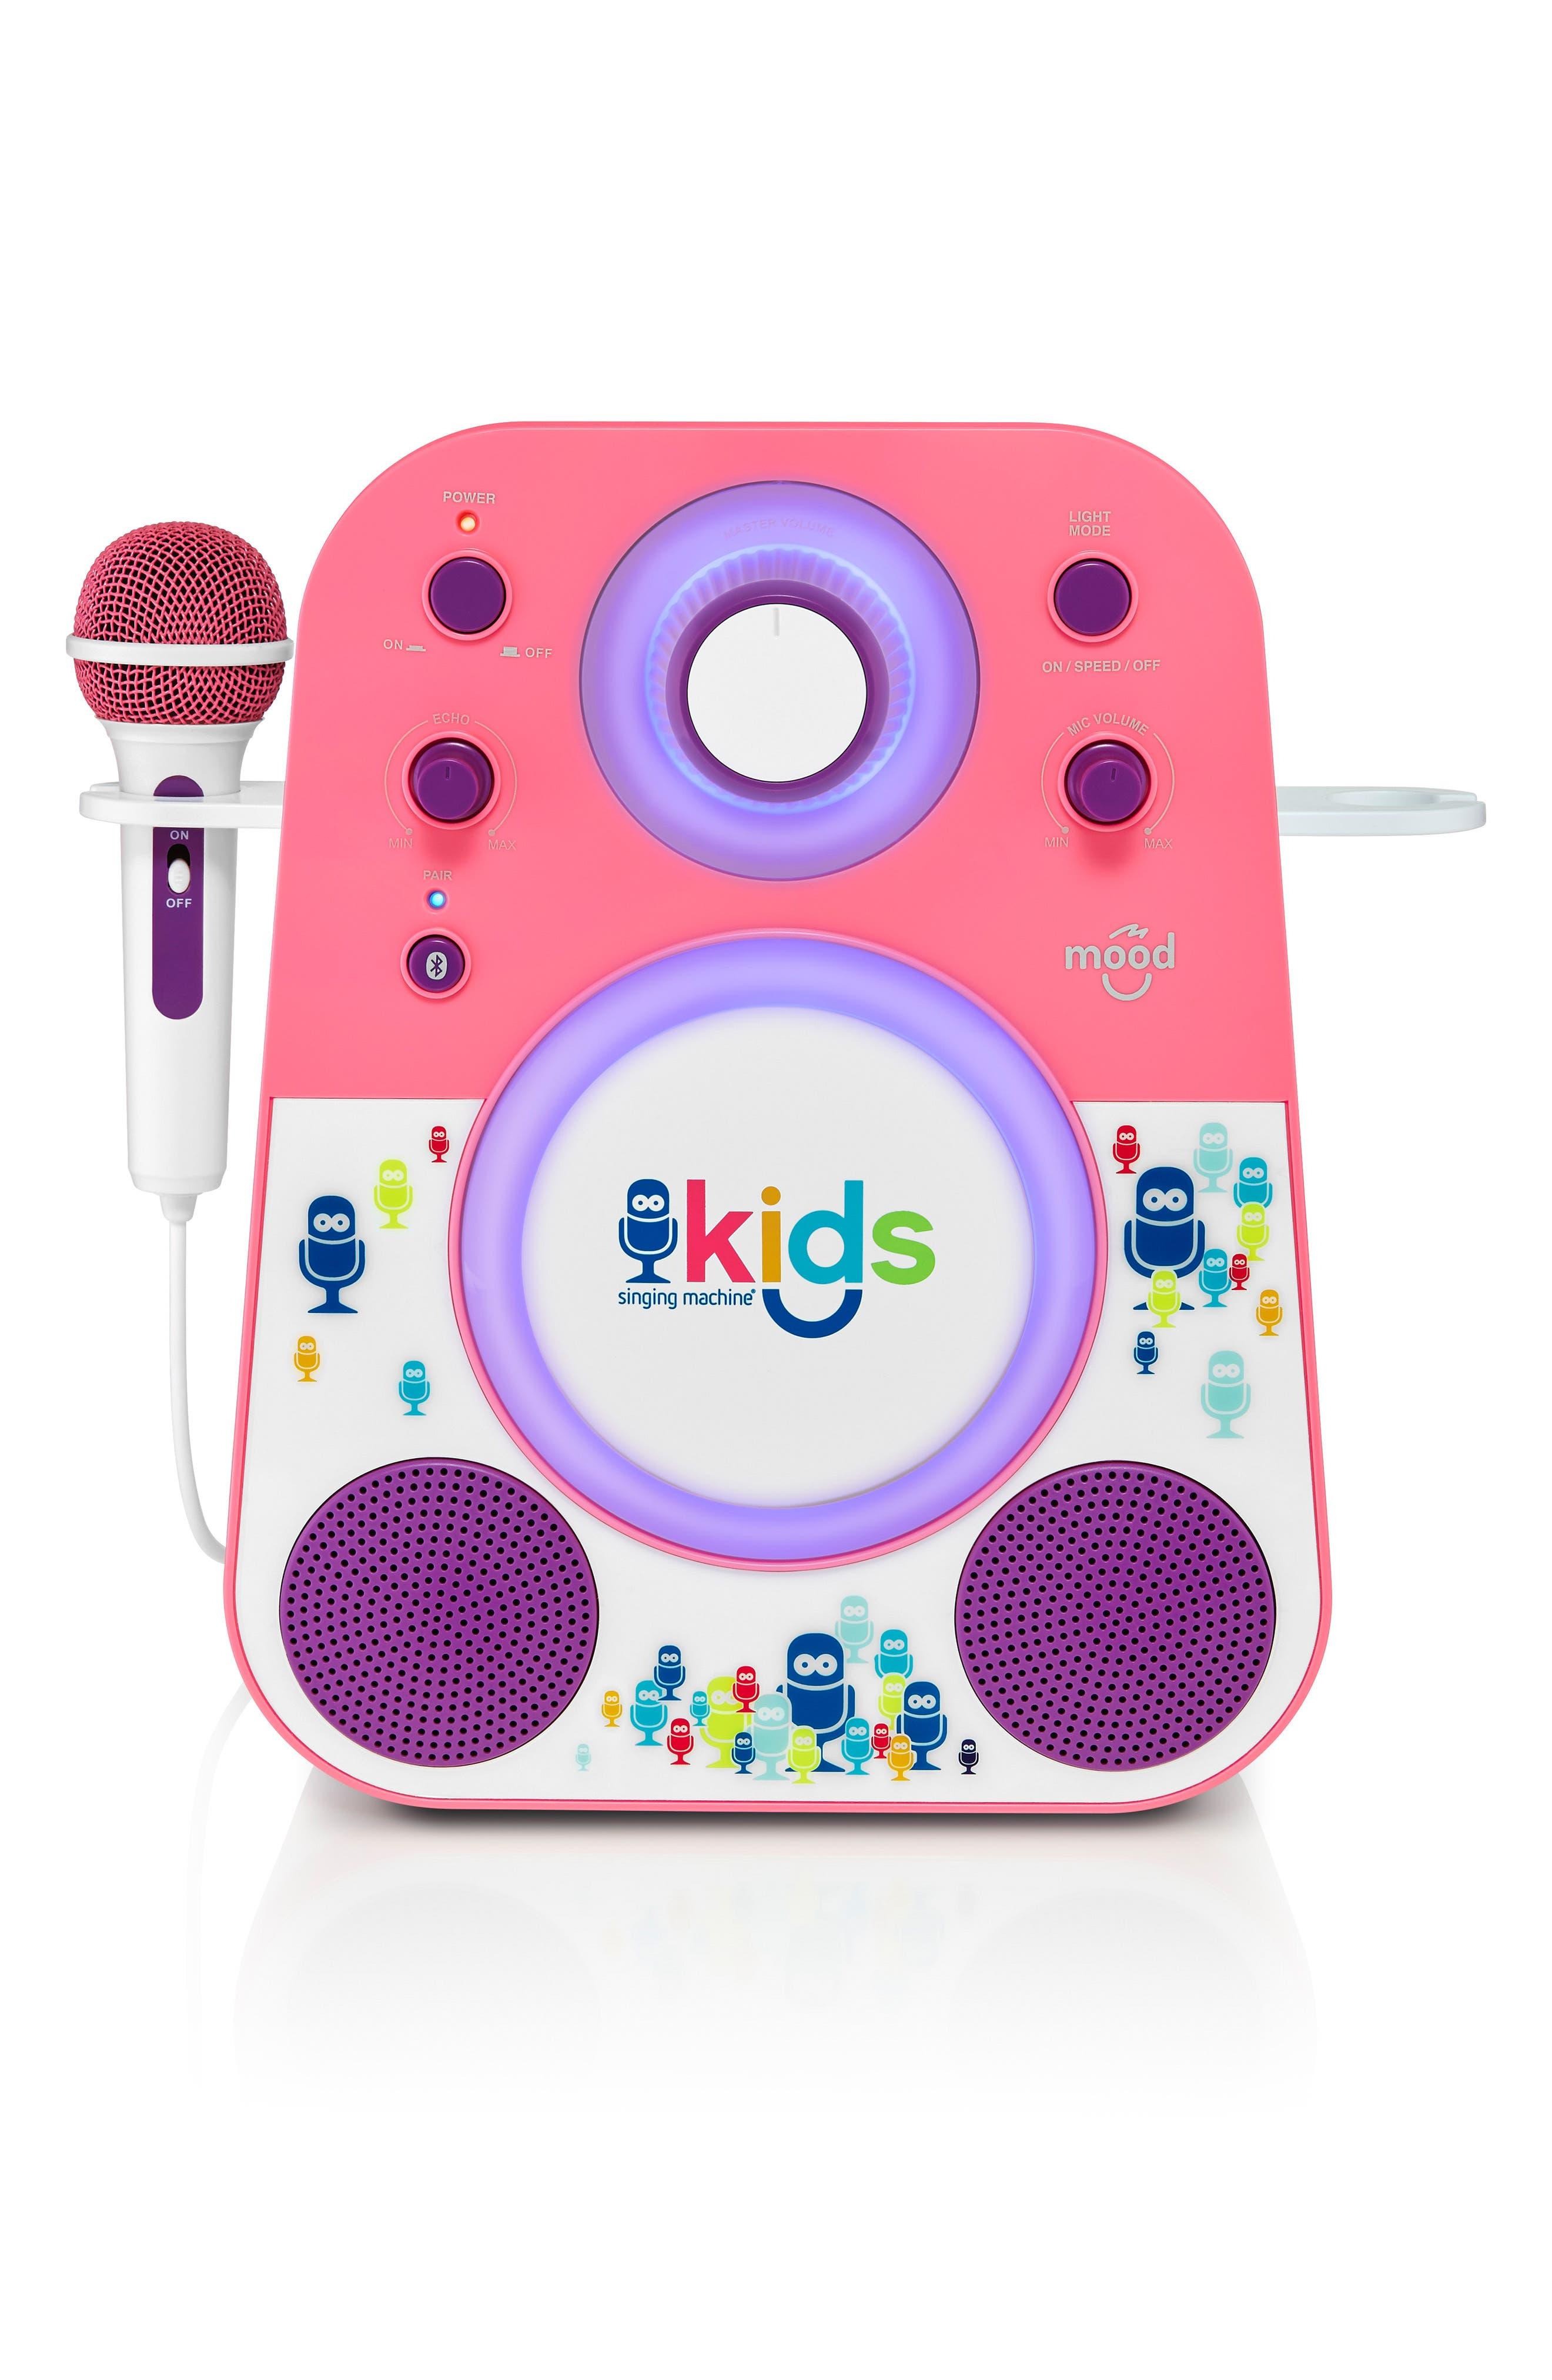 Kids Mood Karaoke System,                         Main,                         color, PINK PURPLE